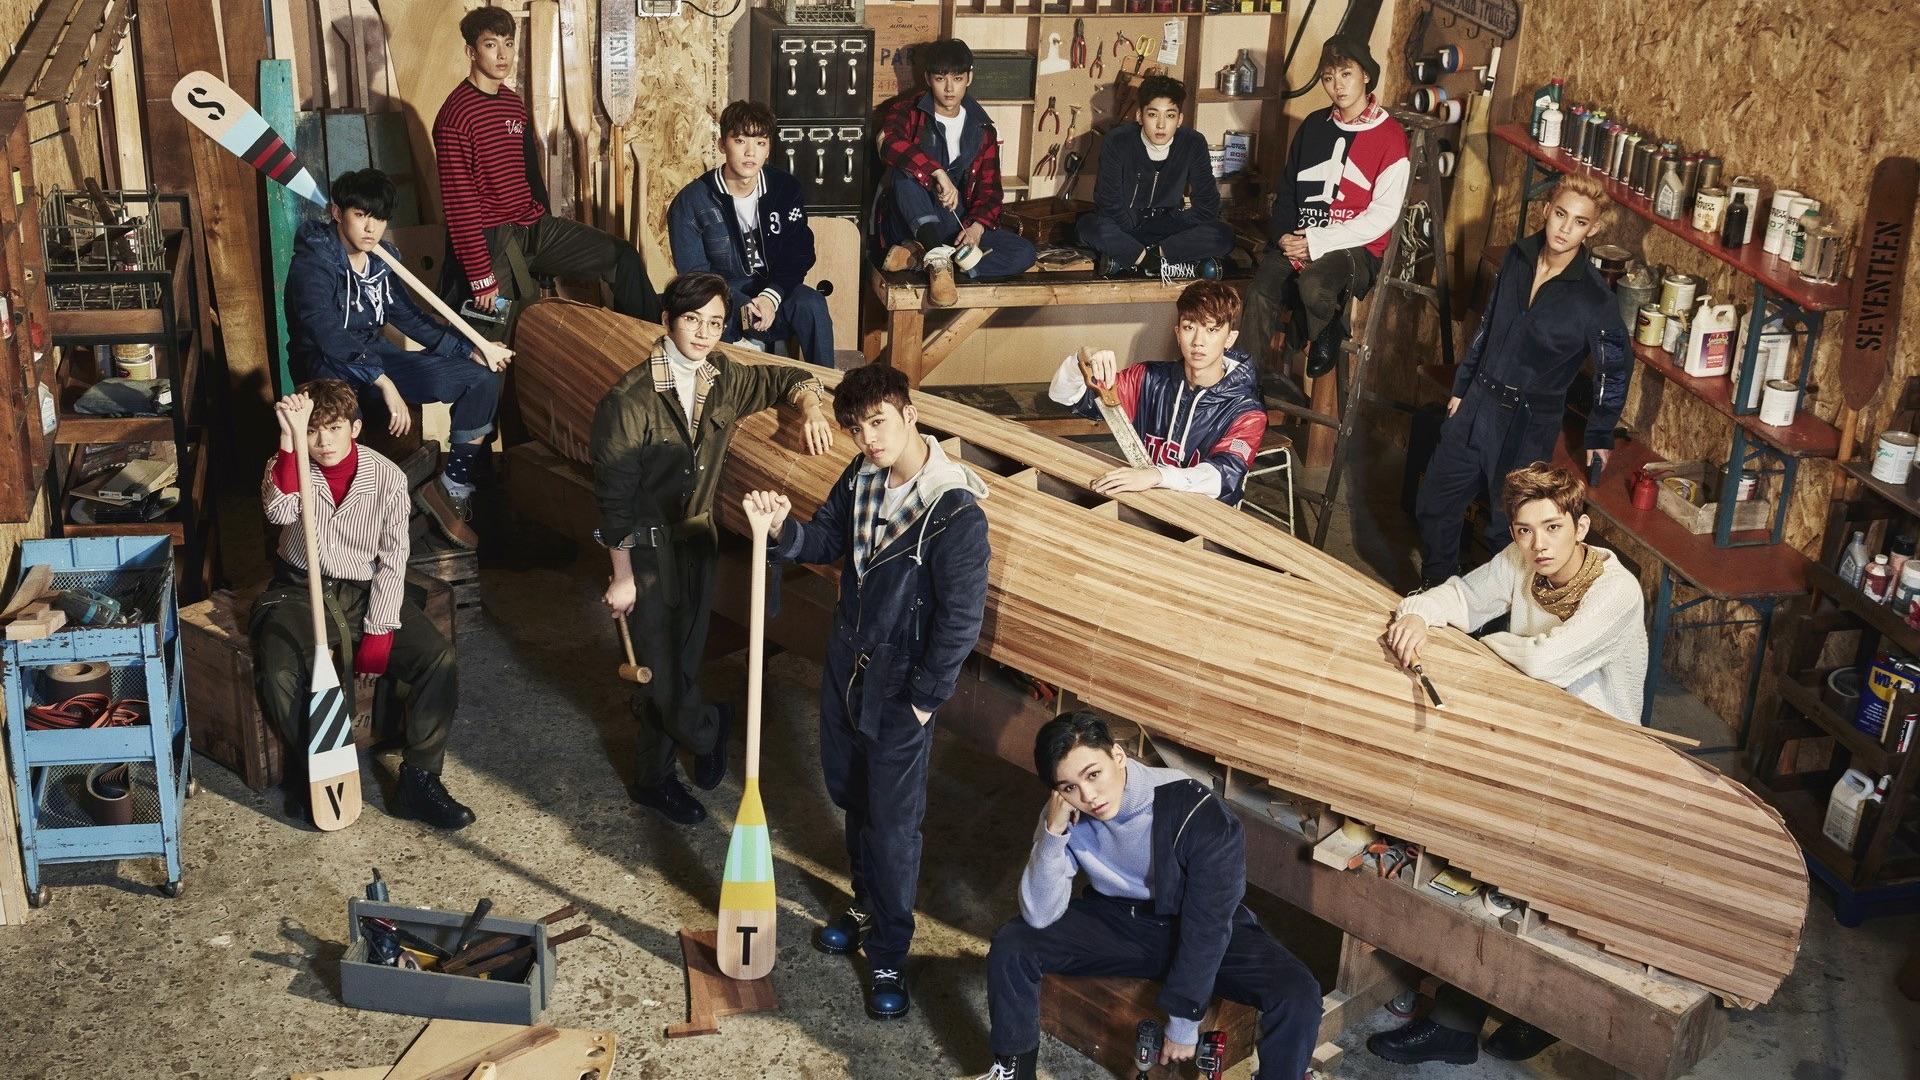 Seventeen - 'Going Seventeen' Album Review   Funcurve